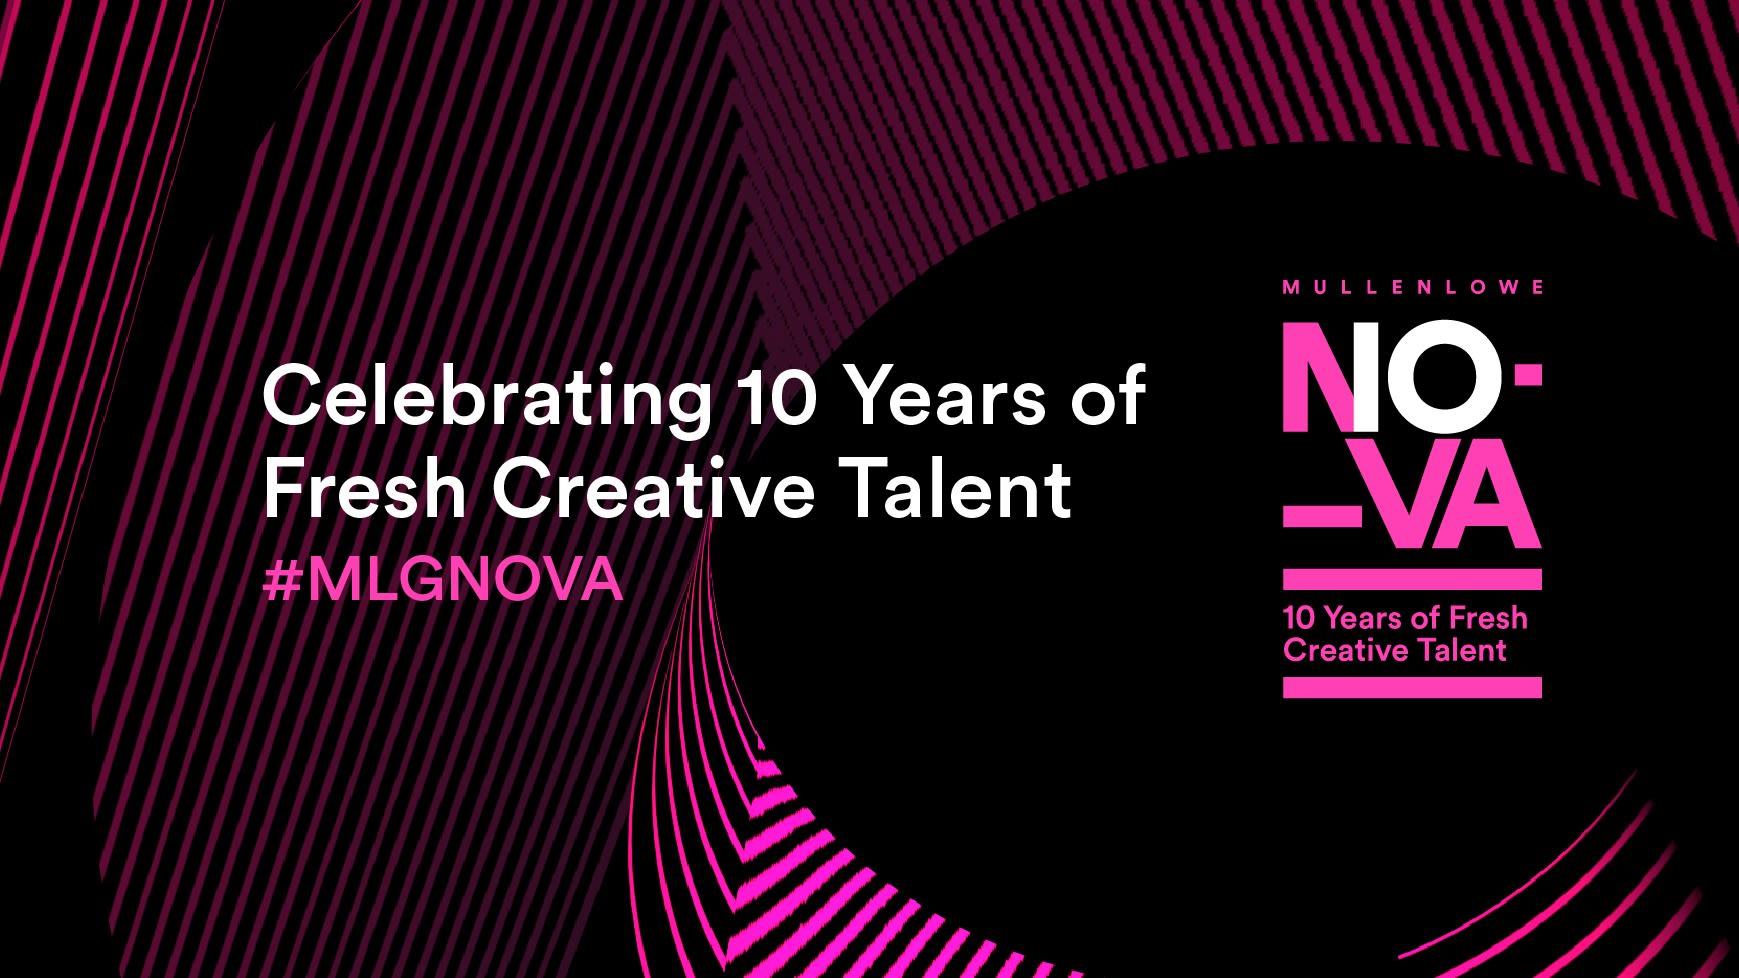 Celebrating 10 years of Fresh Creative Talent, #MLGnova